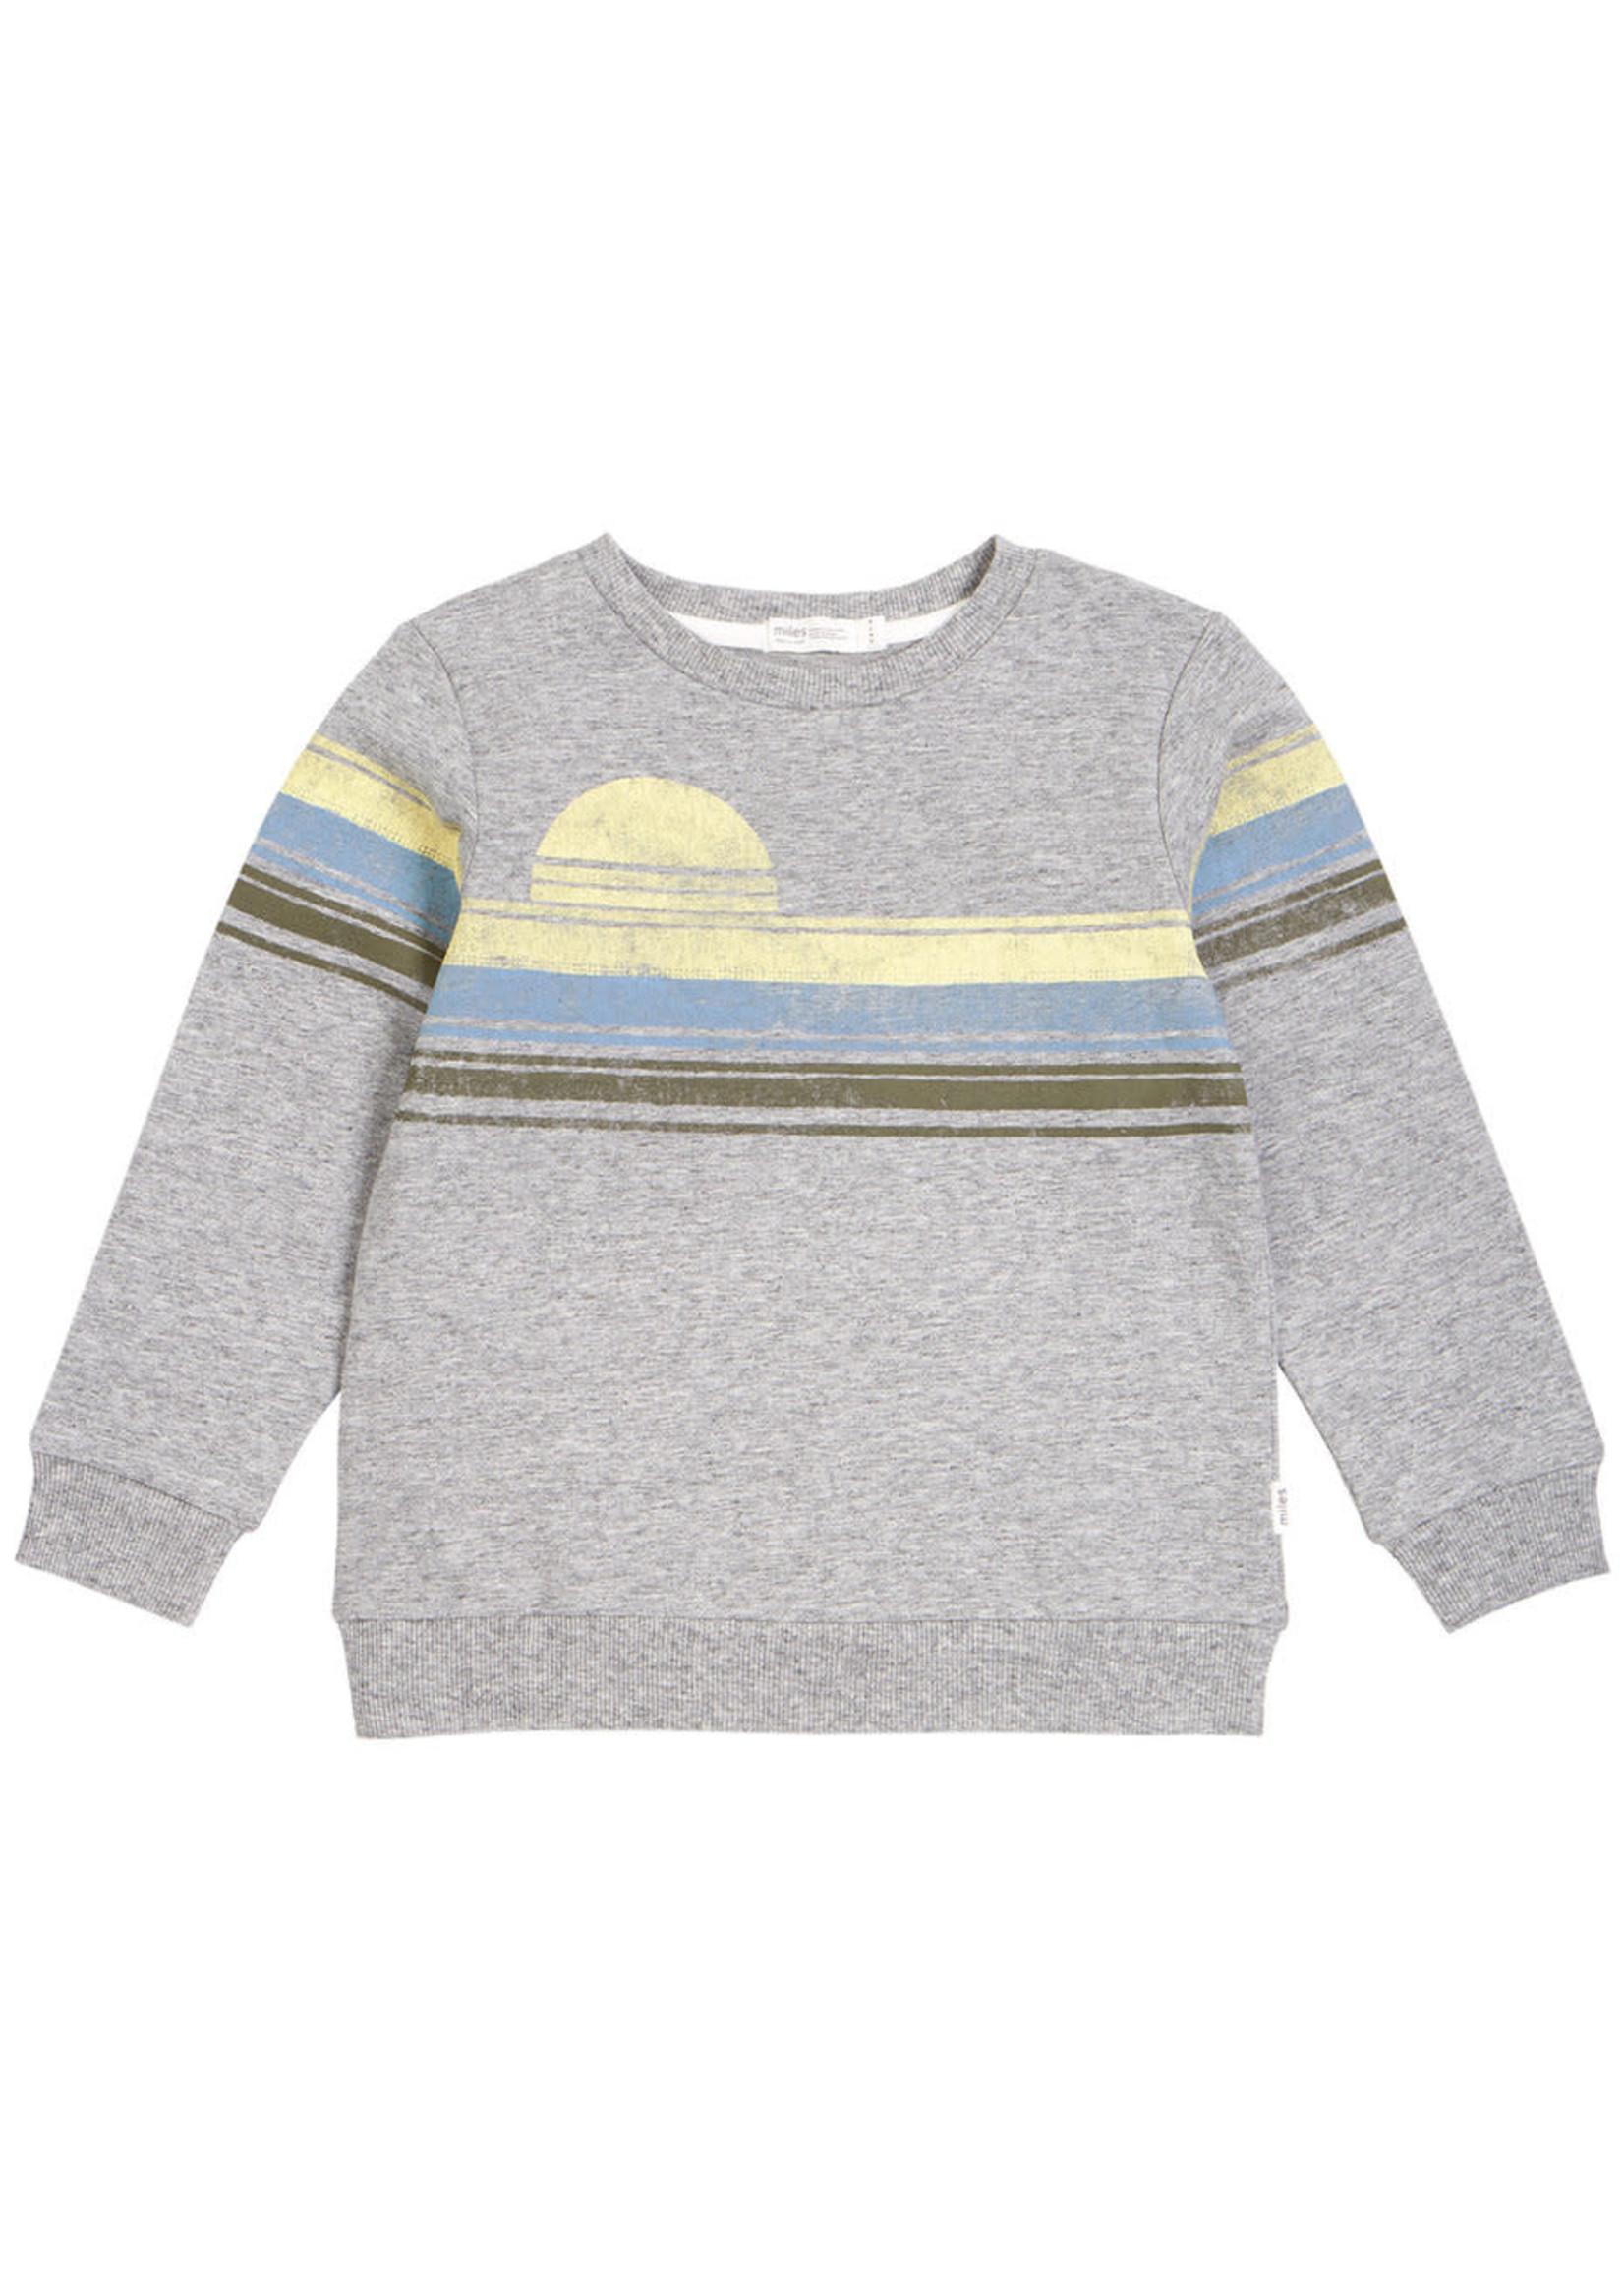 Miles Baby Miles Baby Grey Sweater